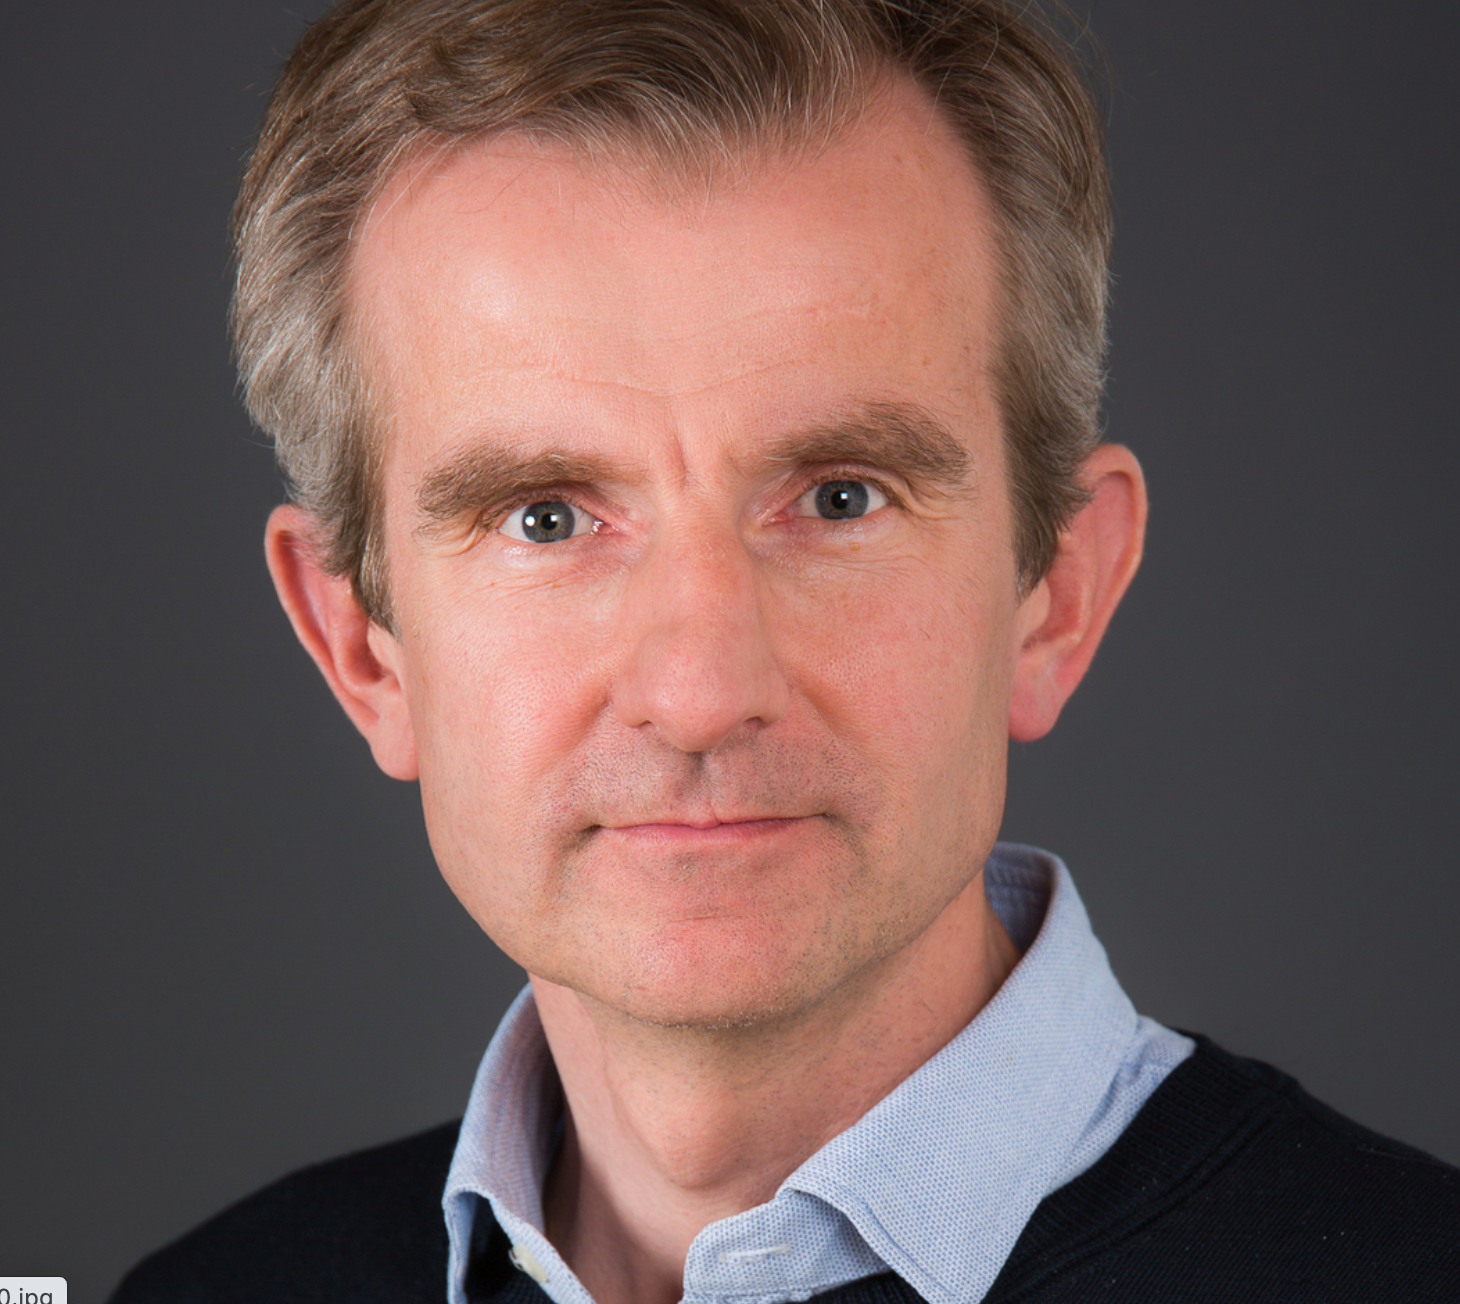 Jan-Paul Brekke